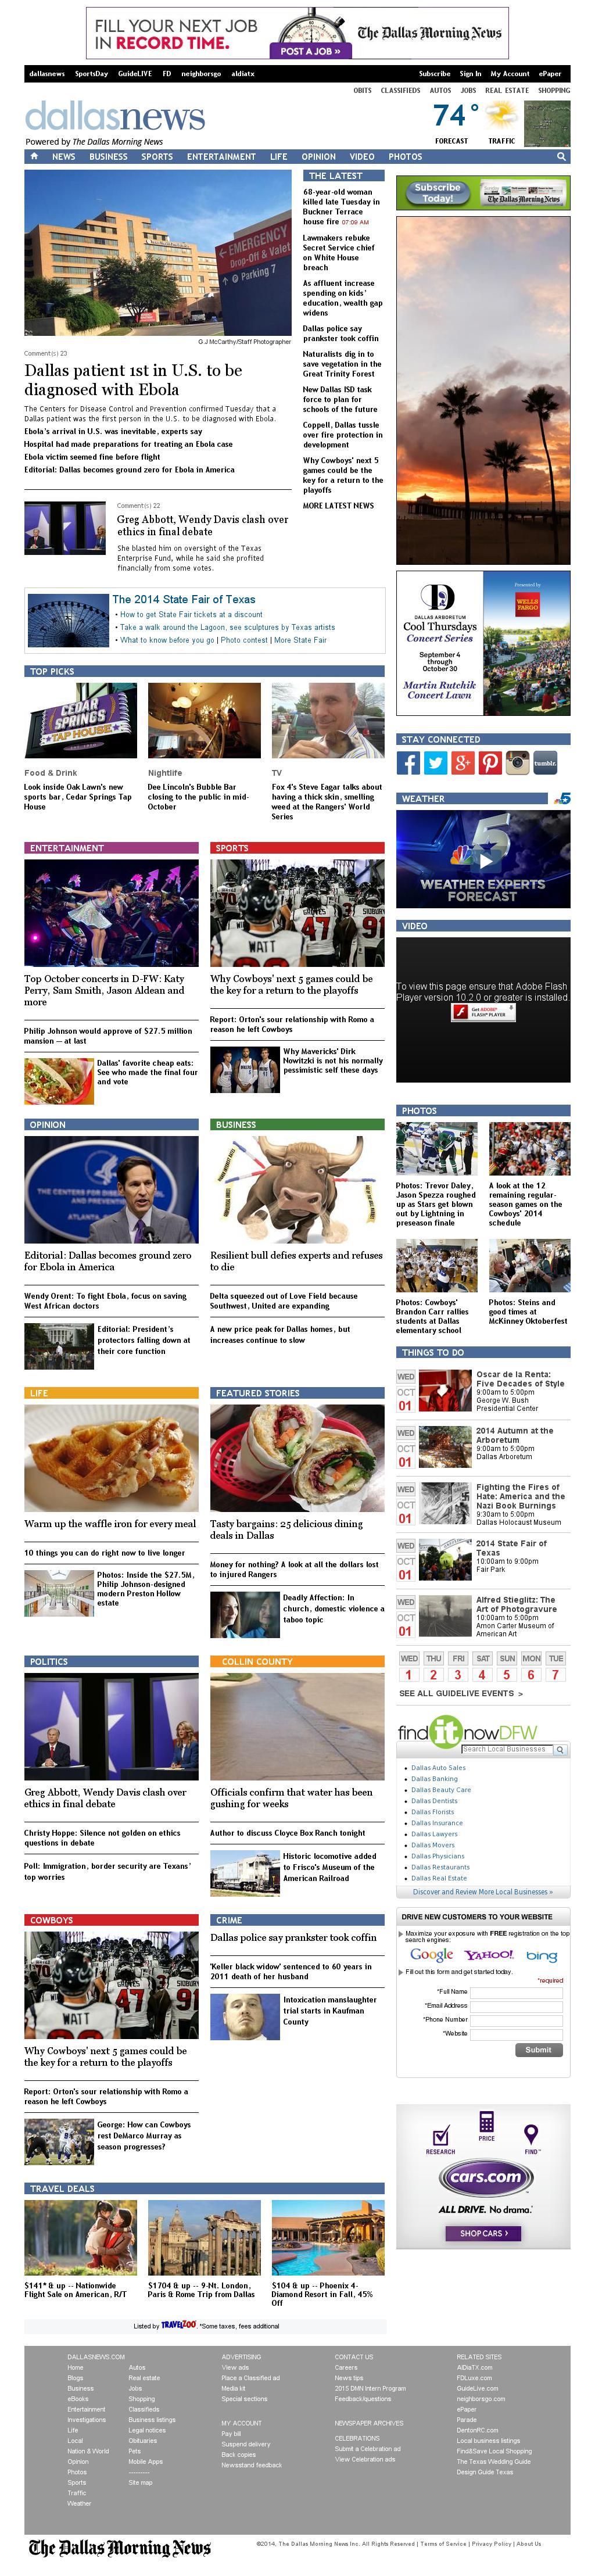 dallasnews.com at Wednesday Oct. 1, 2014, 1:03 p.m. UTC